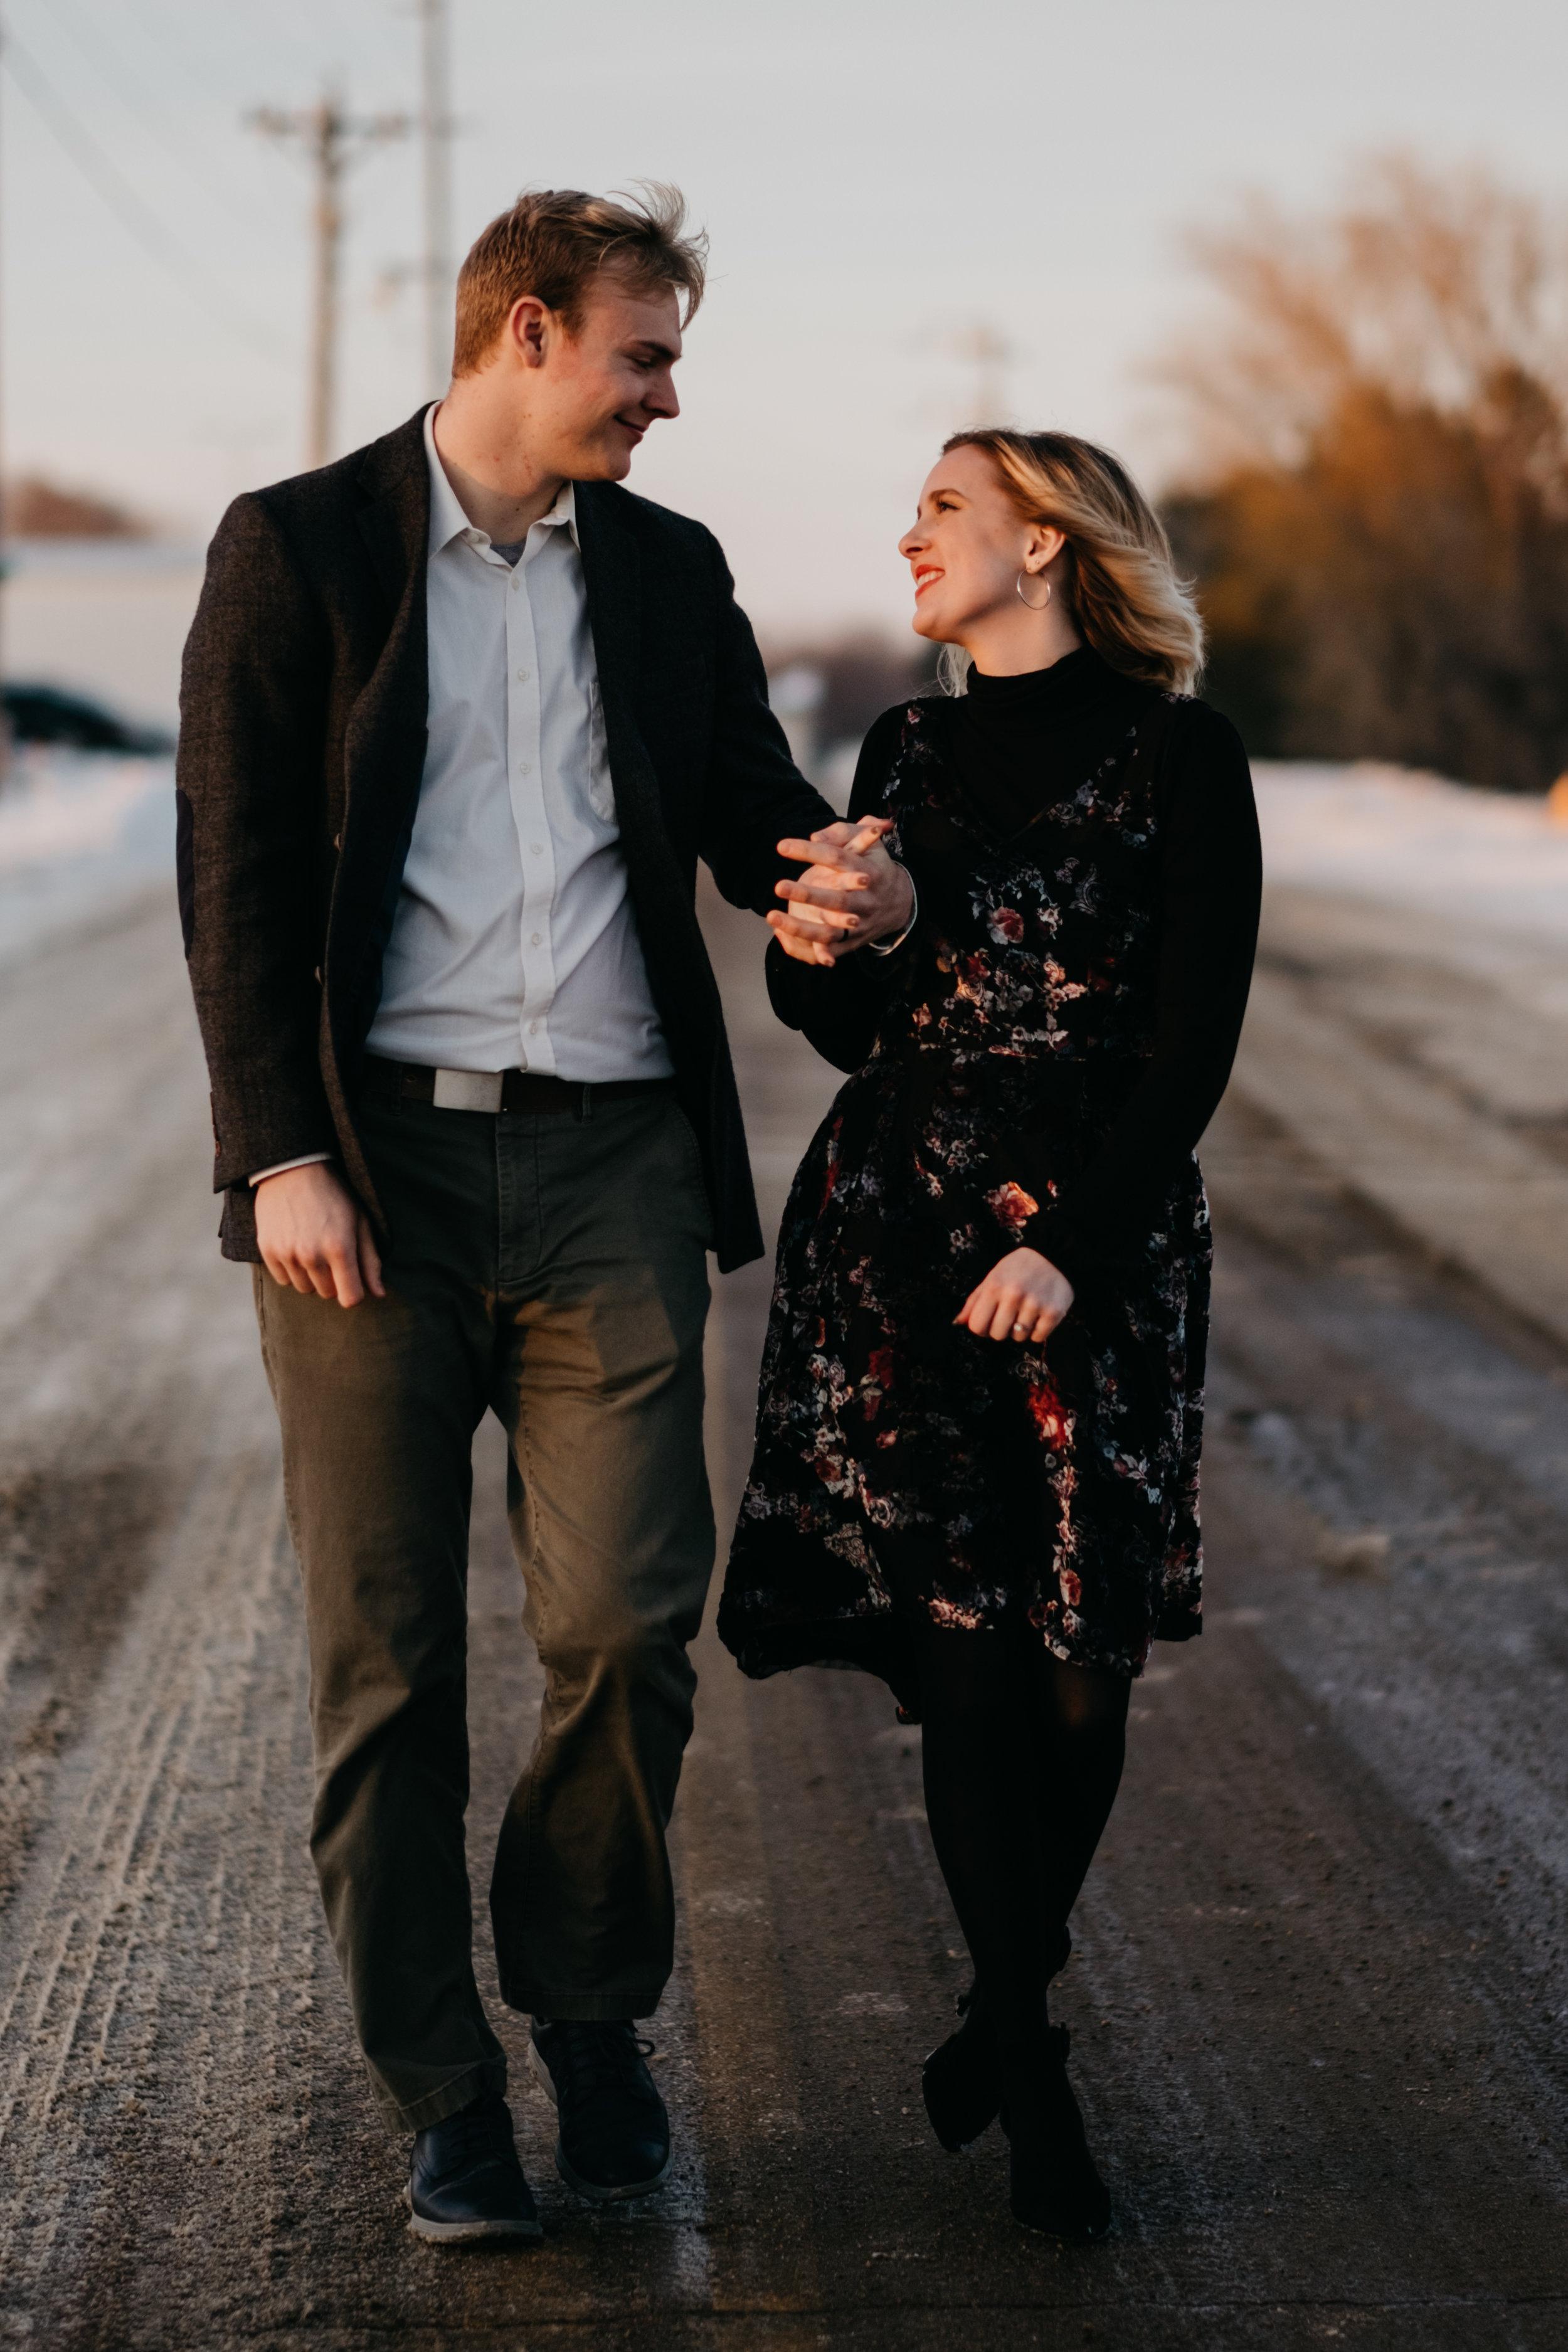 Talia + Brendan | Engagement Photography | Sioux Falls, South Dakota Photographer-128.jpg